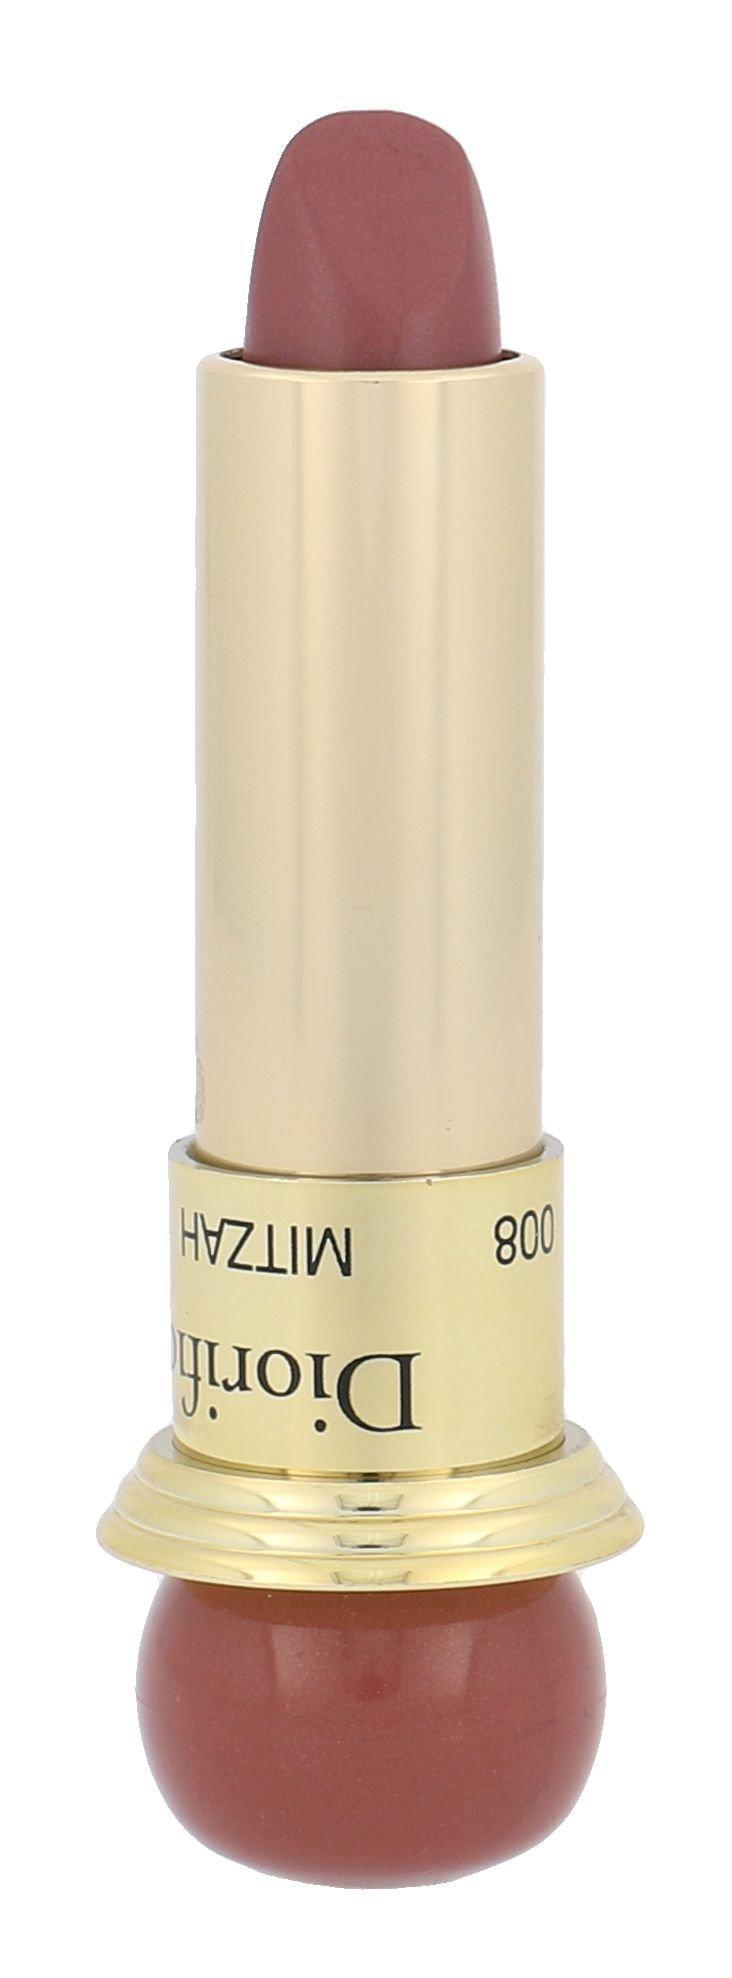 Christian Dior Diorific Cosmetic 3,5ml 008 Mitzah